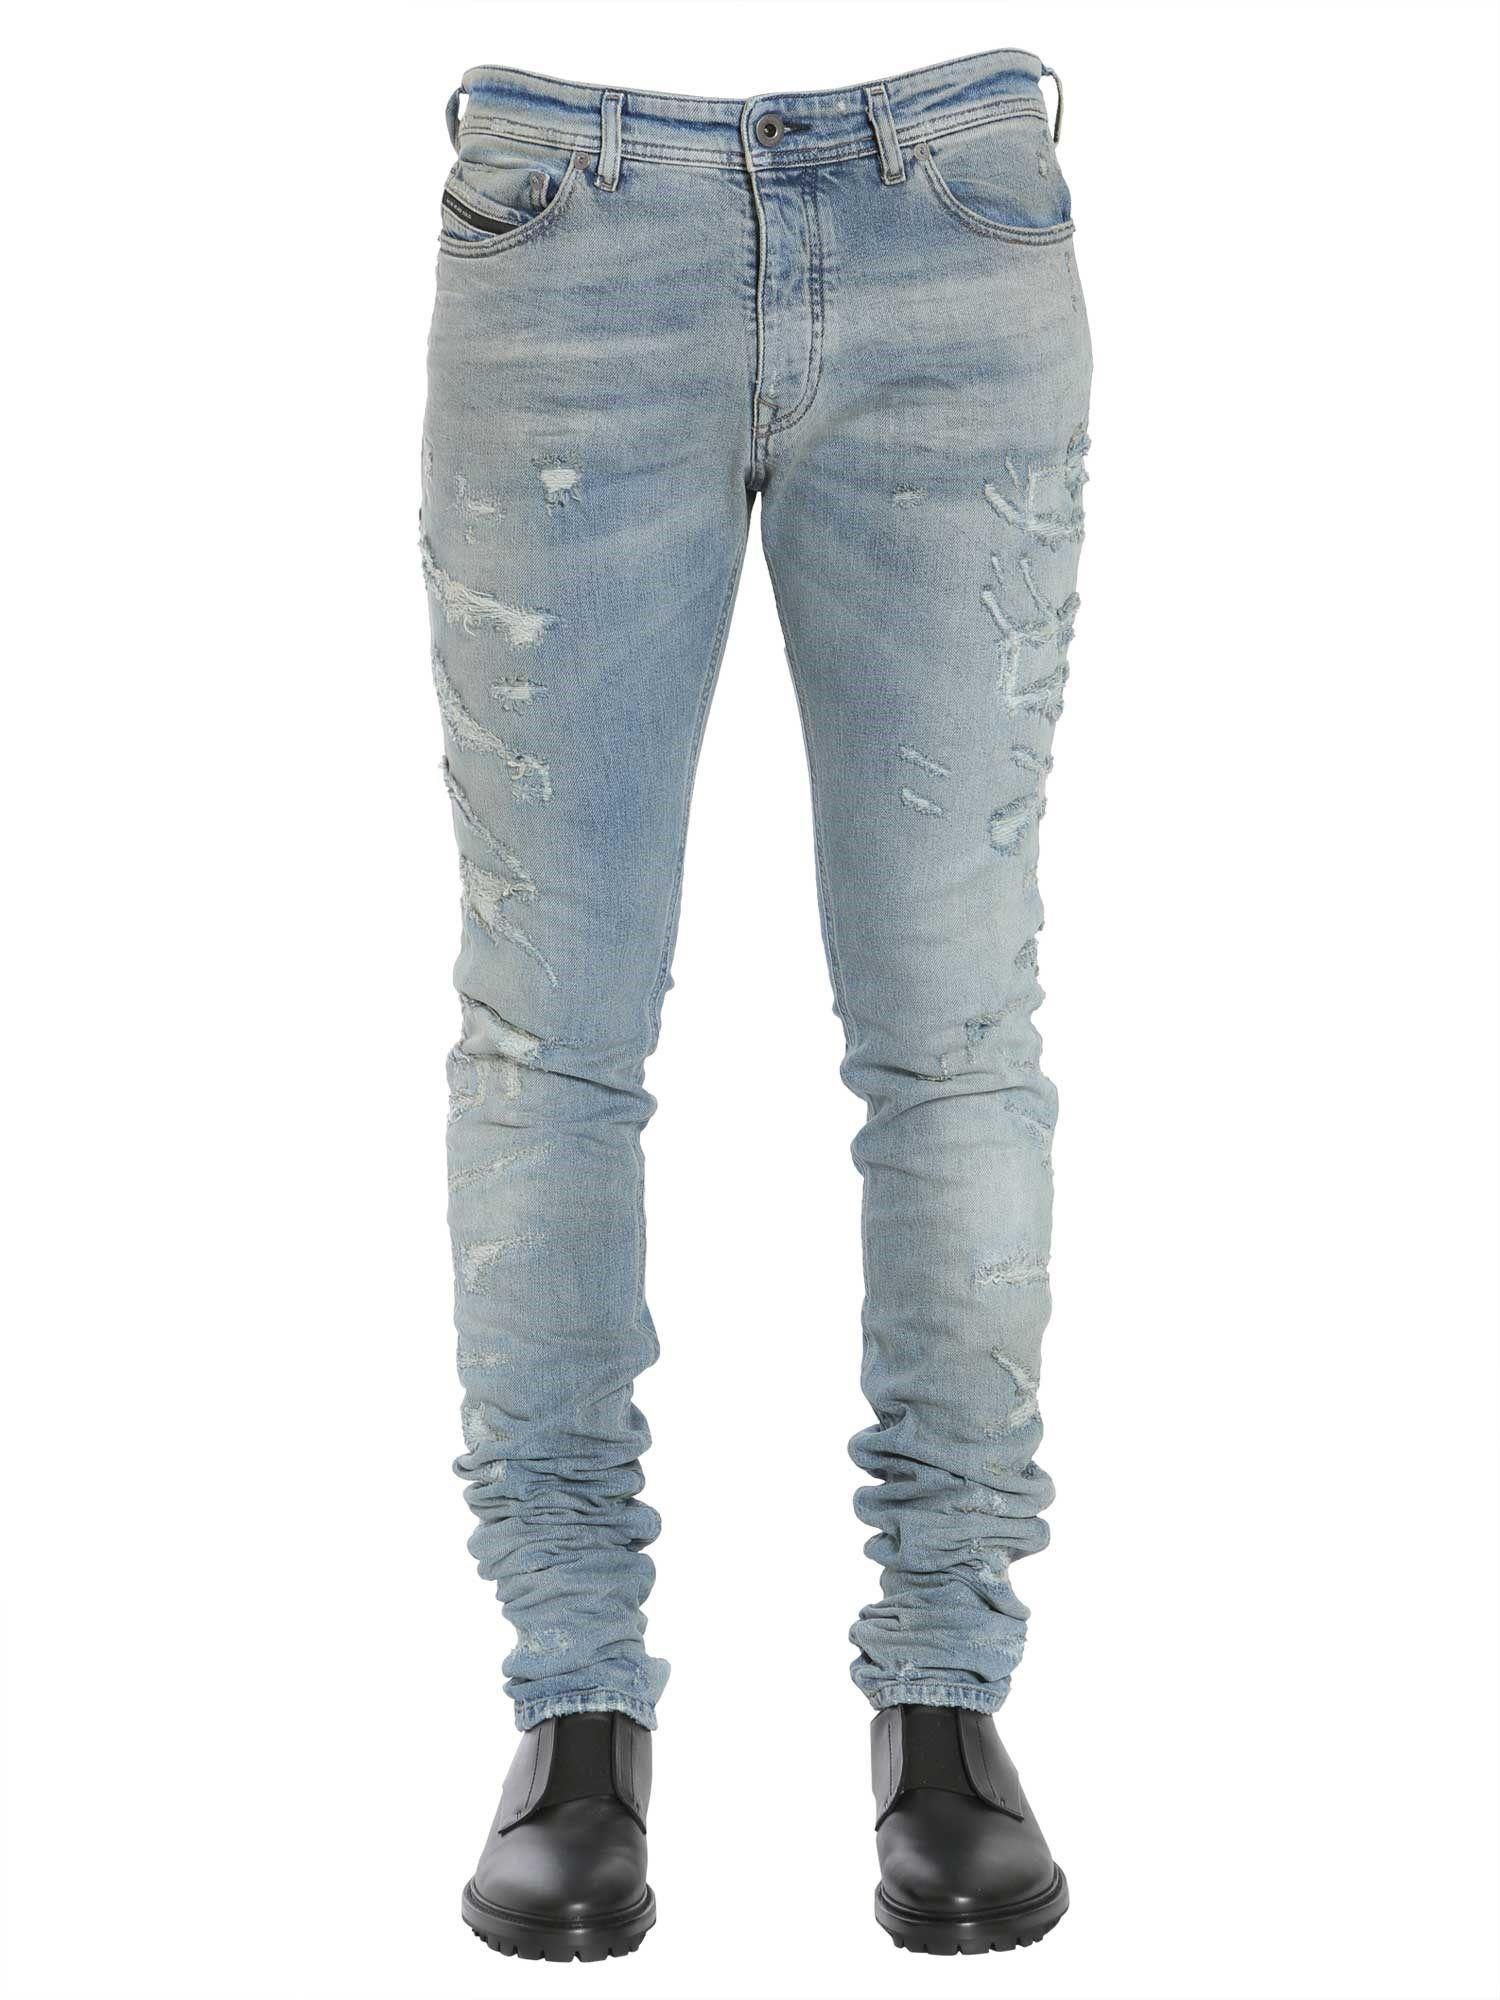 Diesel Black Gold Type-2712 Jeans In Denim